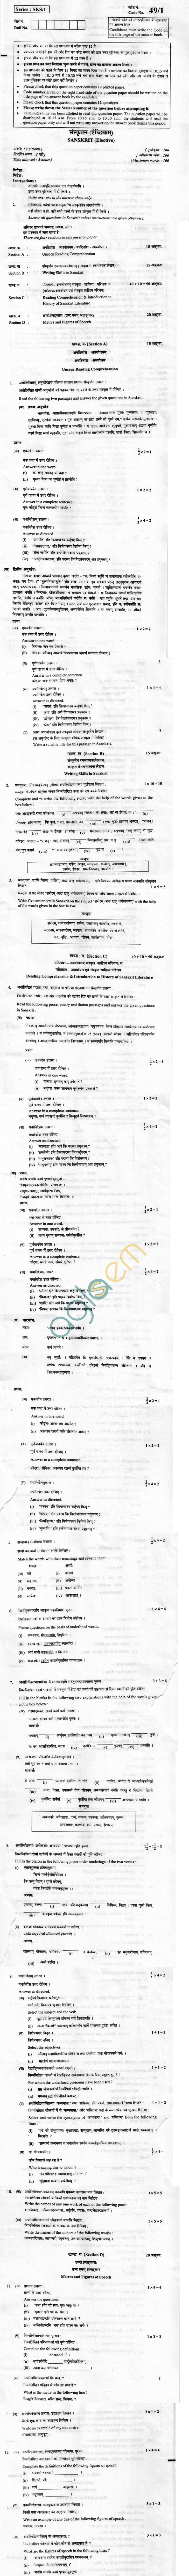 CBSE Board Exam 2013 Class XII Question Paper -Sanskrit (Elective)